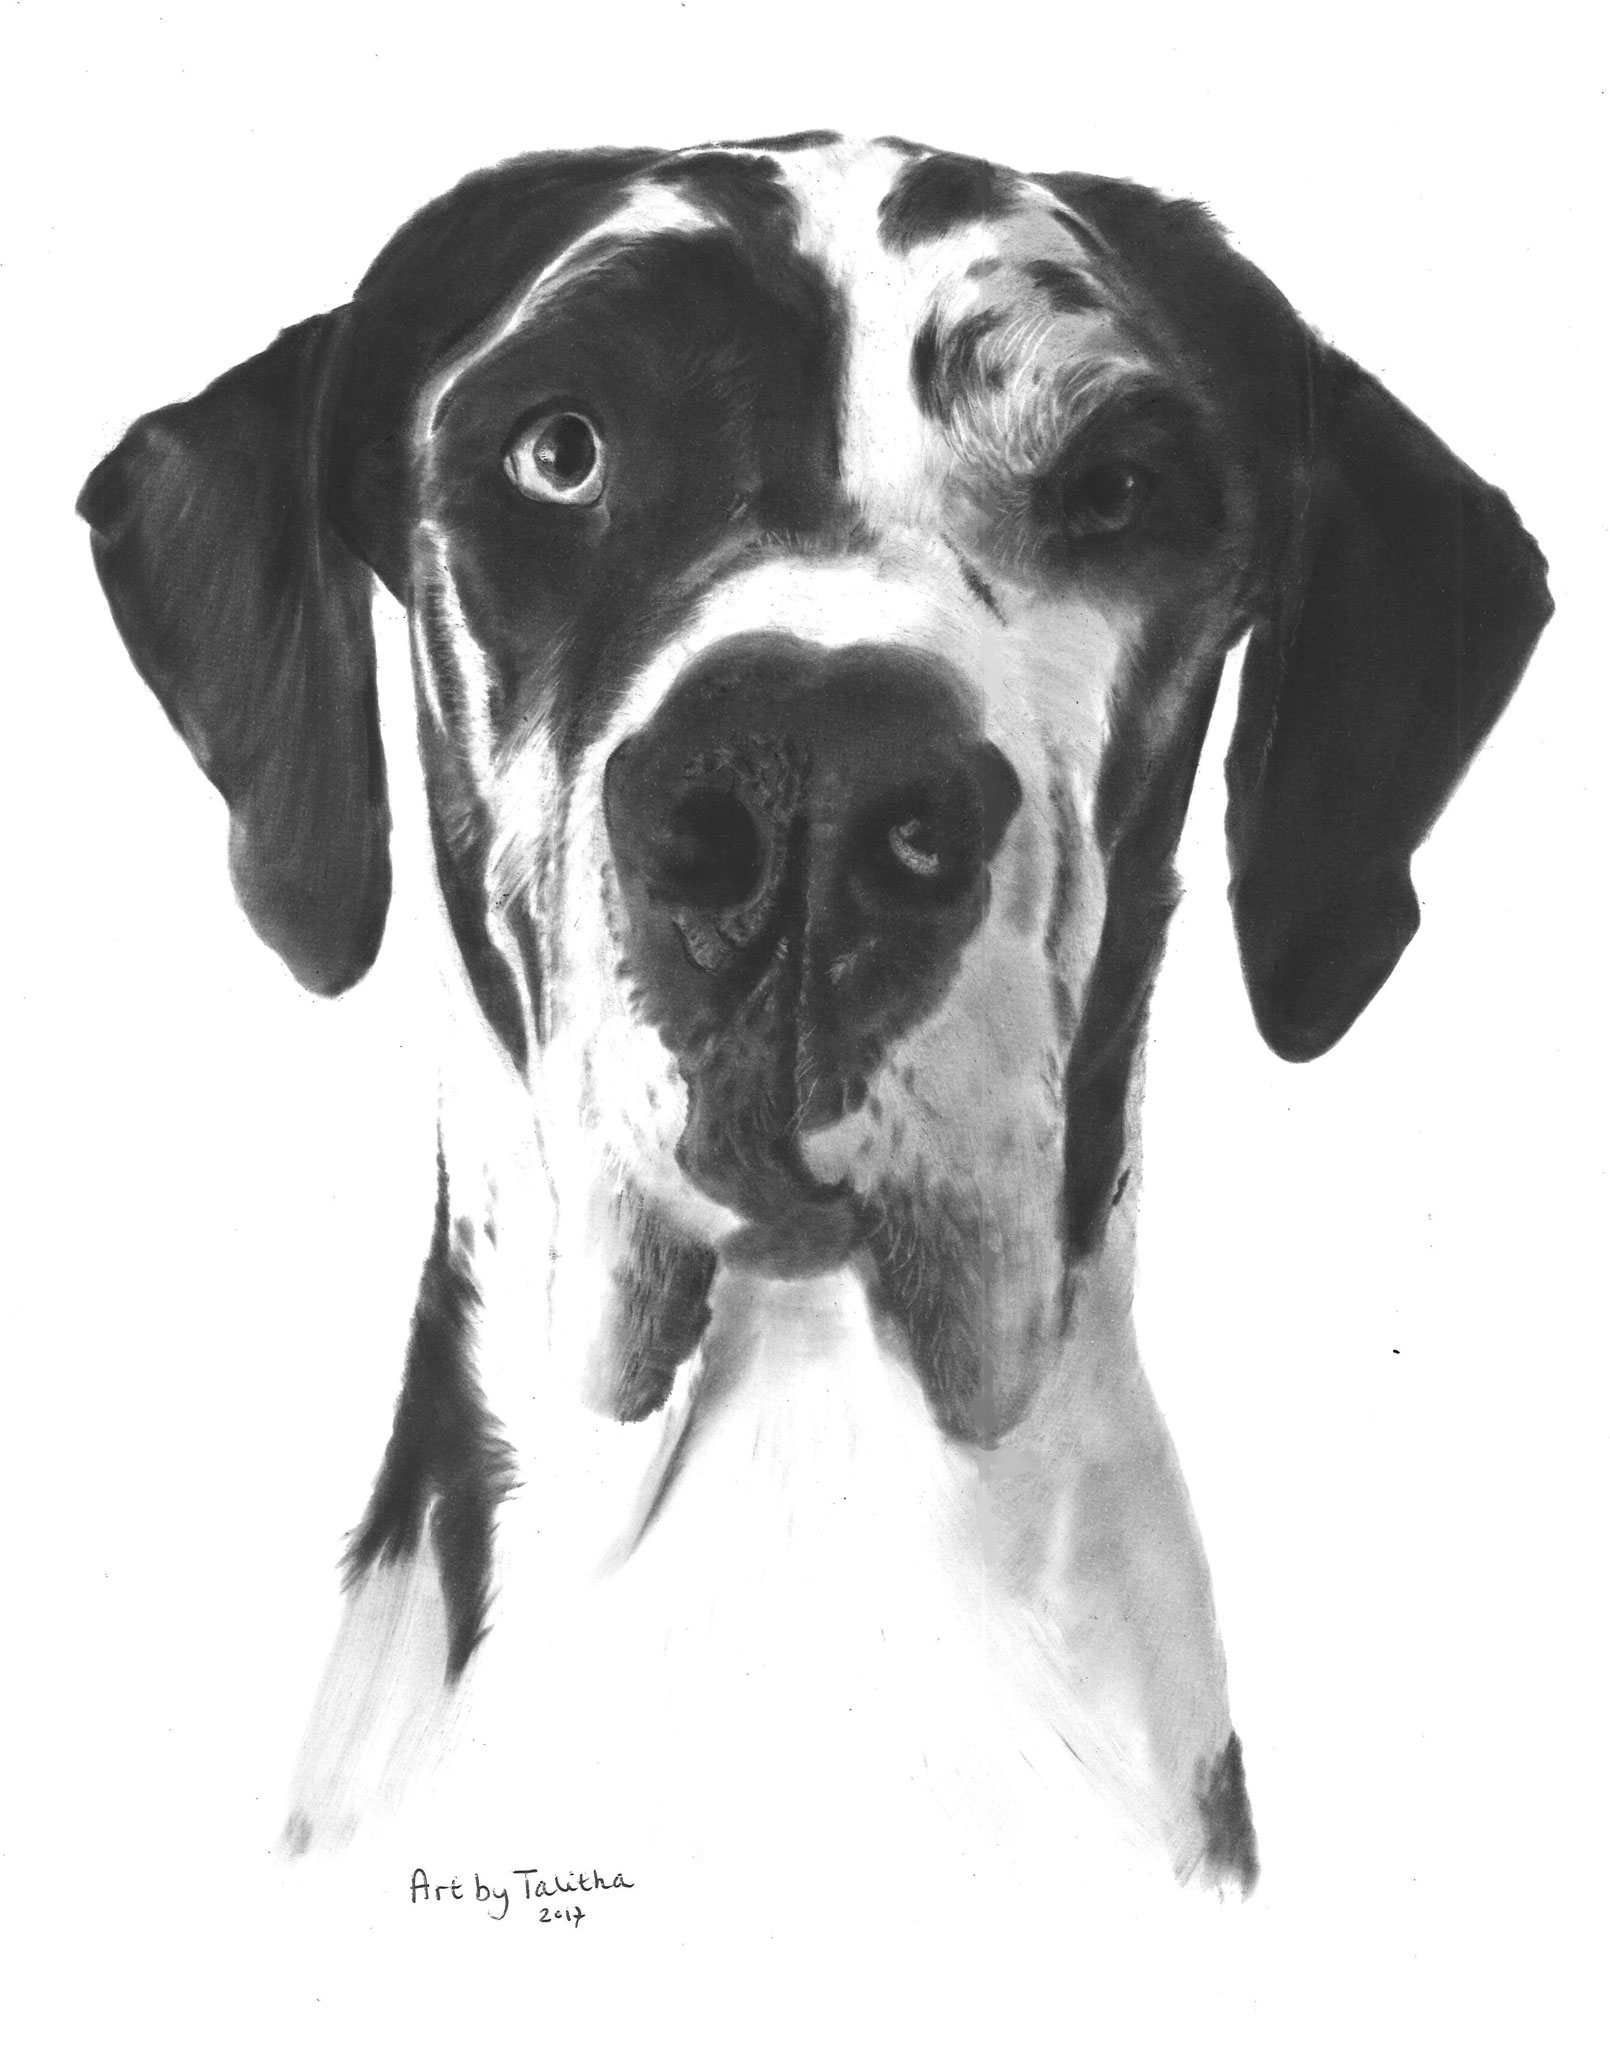 'Loena de Duitse Dog'